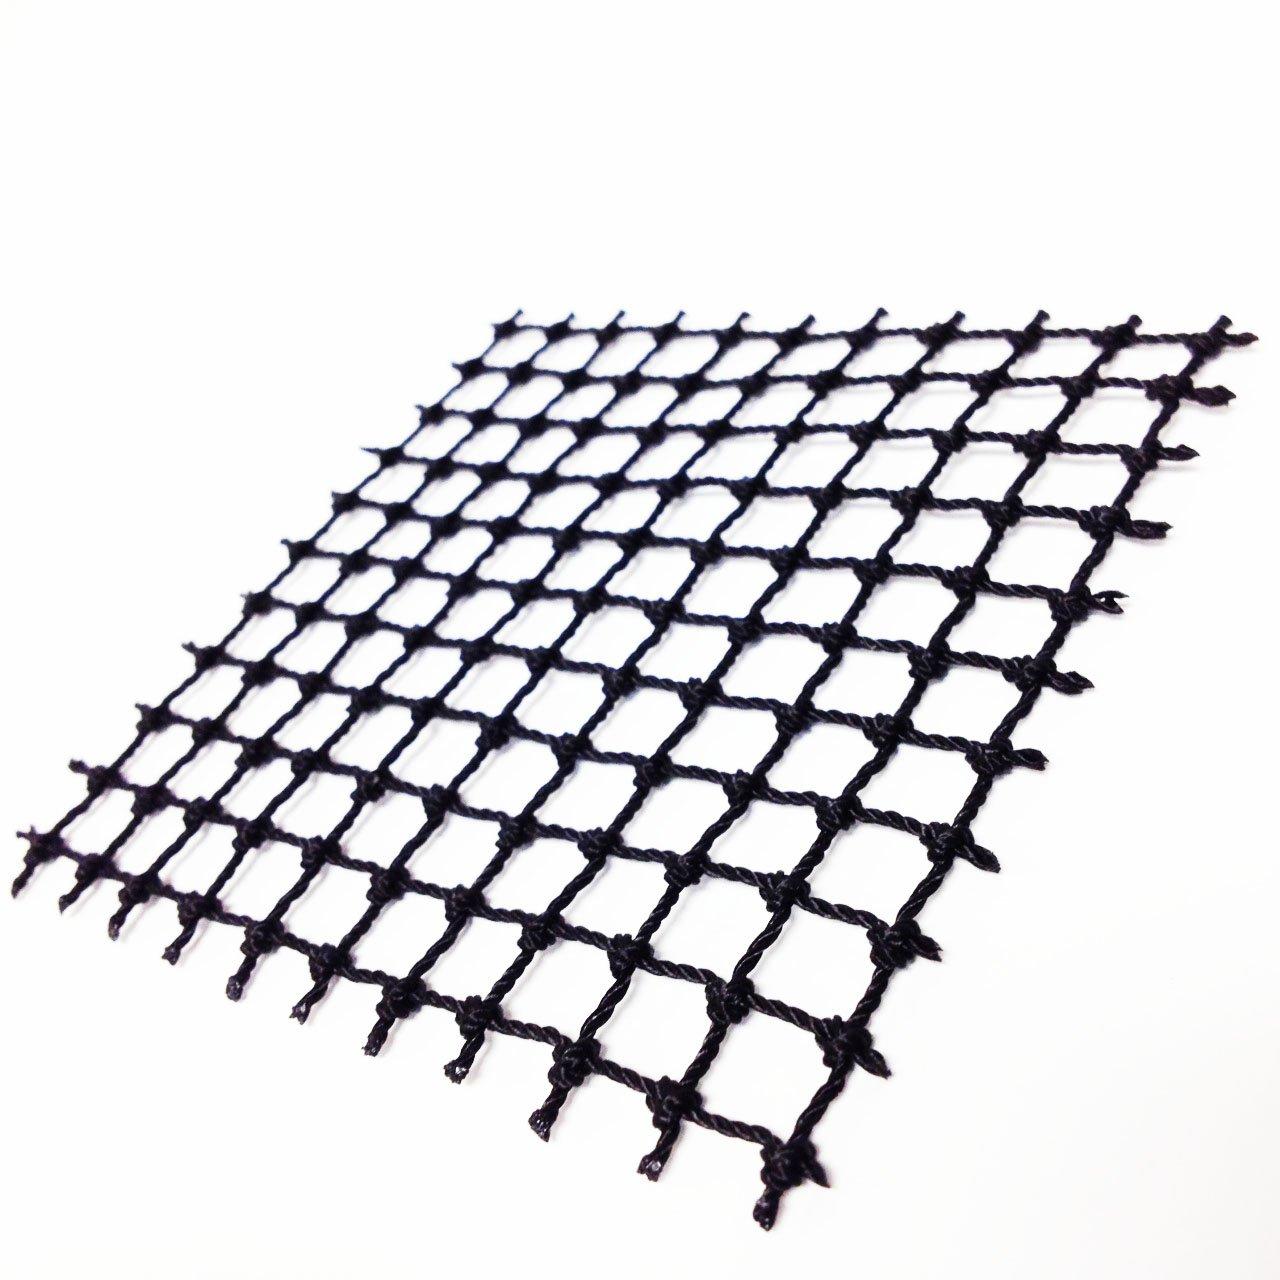 LEGO Black 10x10 String Net